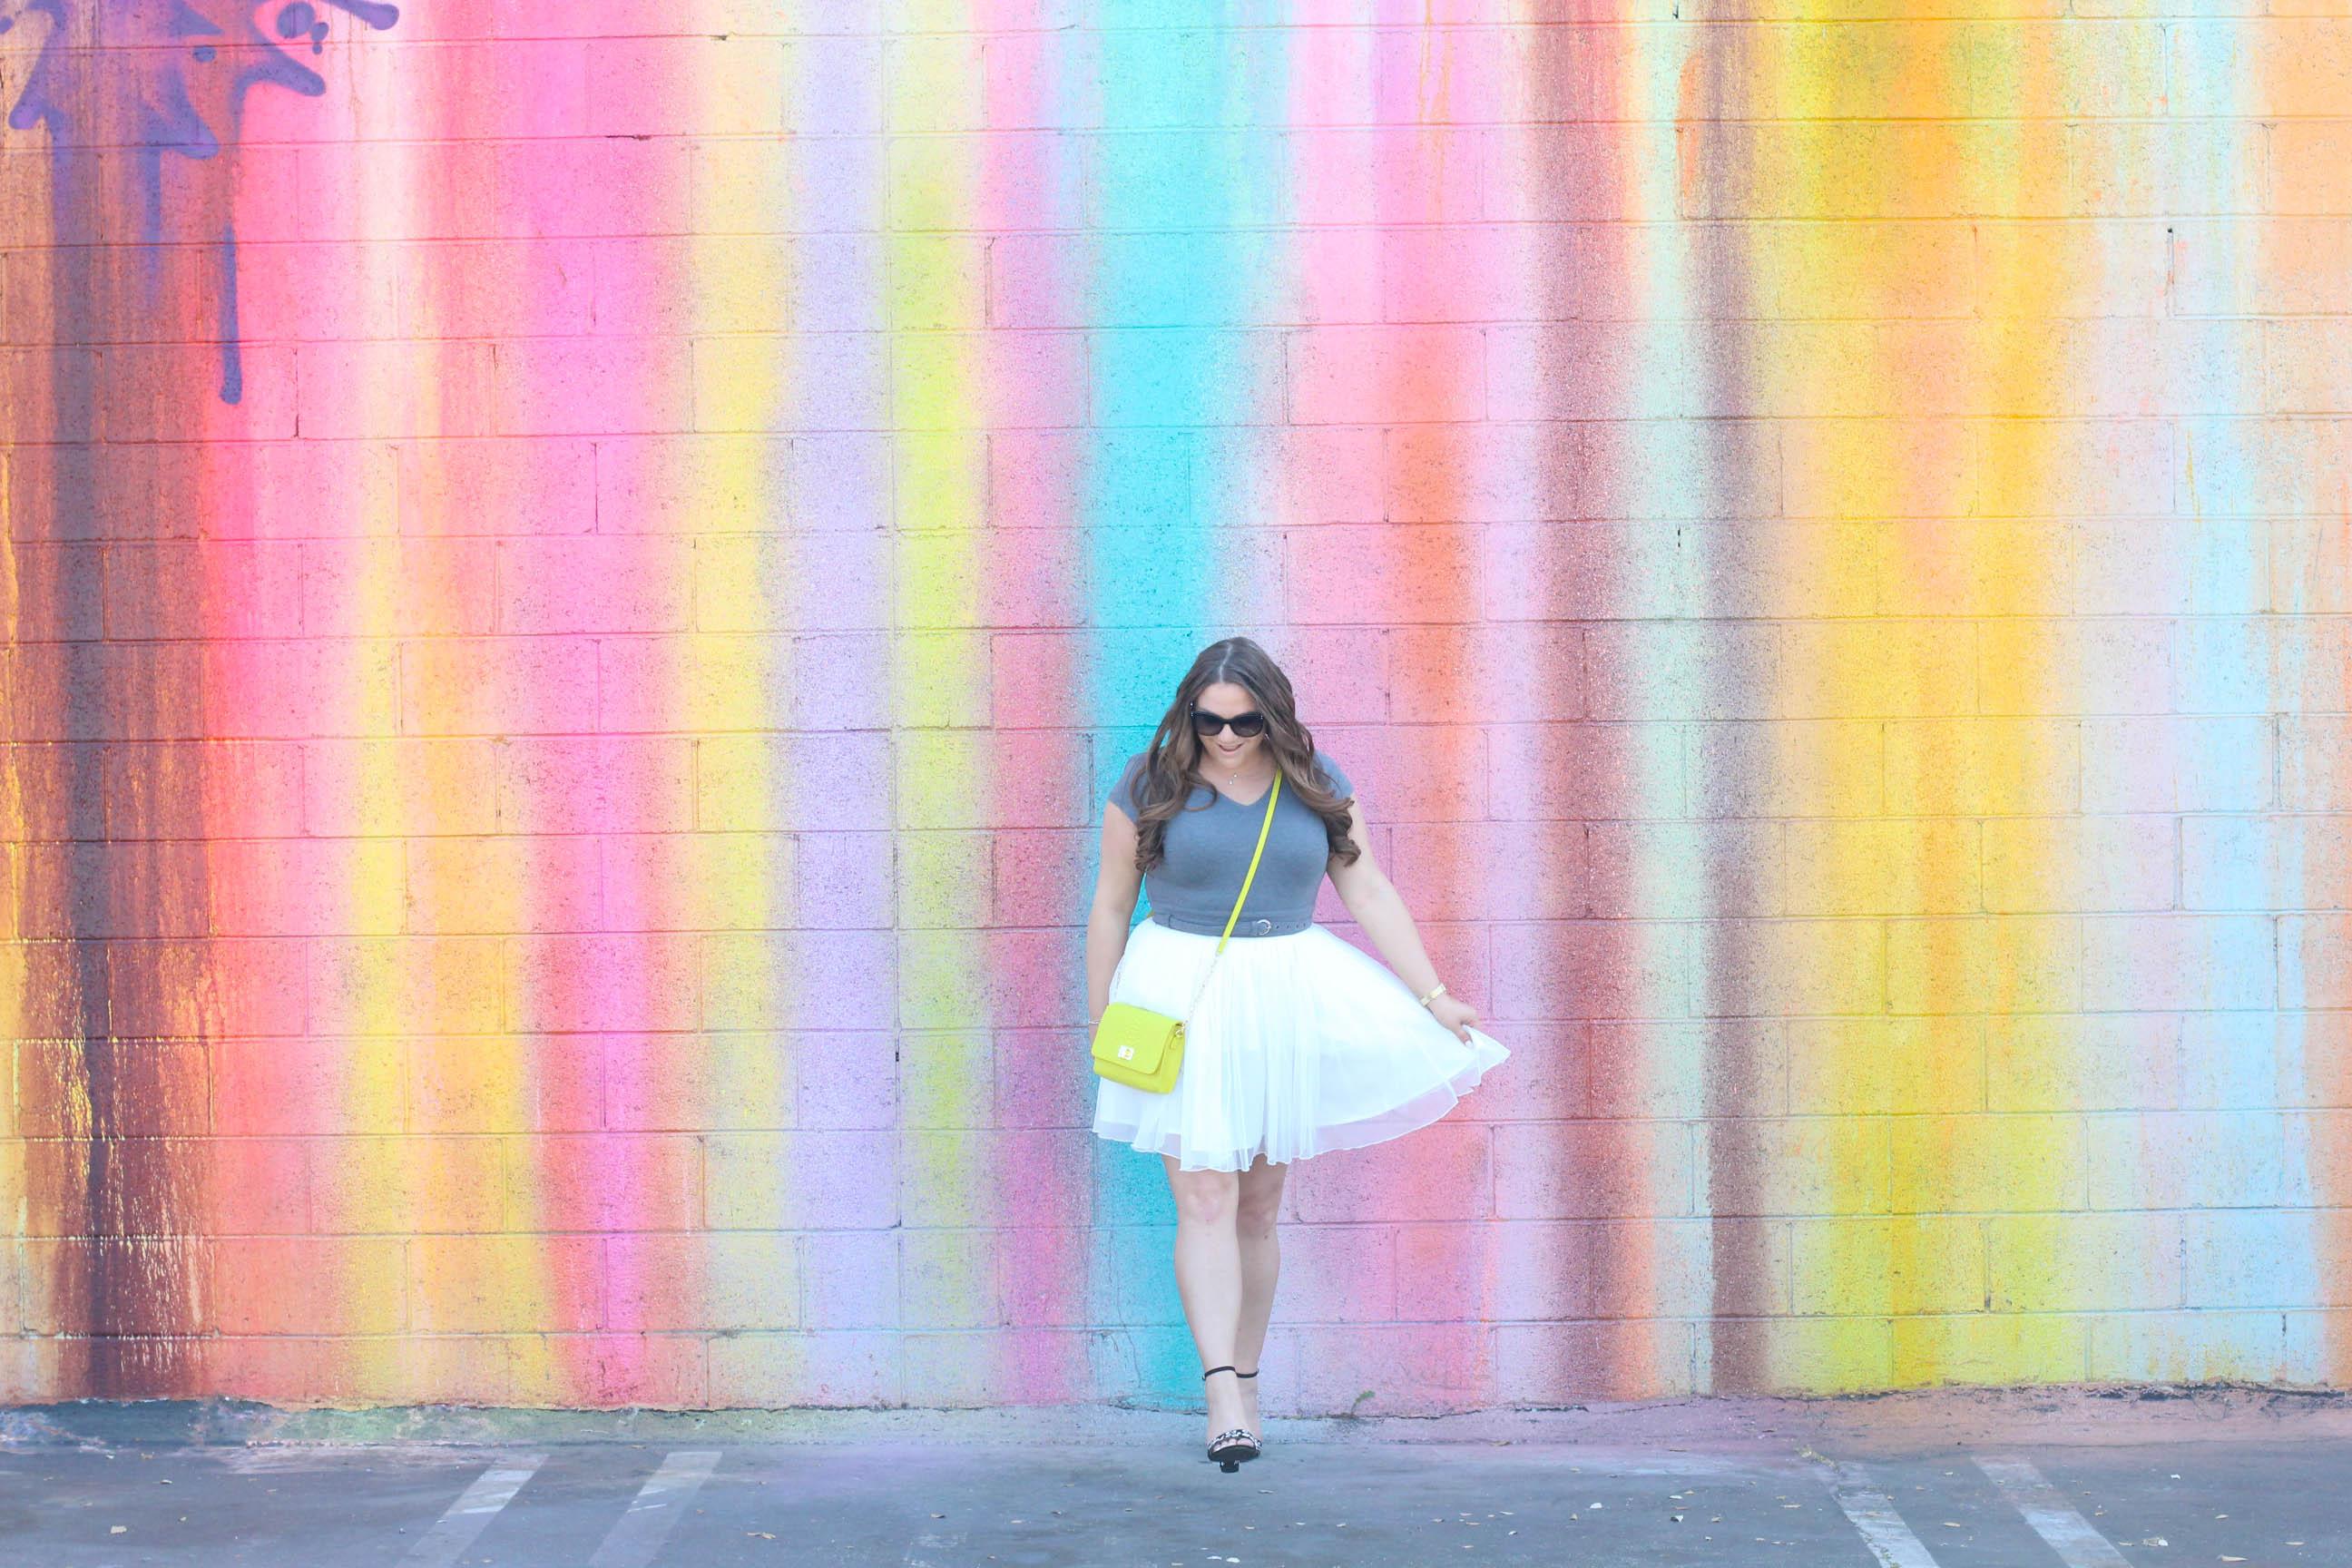 missyonmadison, missyonmadison blog, missyonmadison instagram, melissa tierney, melissa tierney blogger, la blogger, fashion blogger, fashion trends, eshakti, eshakti dress, tulle skirt, tulle dress, bloglovin, style blog, style blogger, spring style, wall crawl, la colorful walls, la wall murals, gigi ny crossbody bag, gigi new york bag, gigi new york crossbody bag, gray bodysuit, sugar brand heels, sugar brand shoes, black floral heeled sandals, black floral ankle strap heels, fendi sunglasses, spring style 2018,